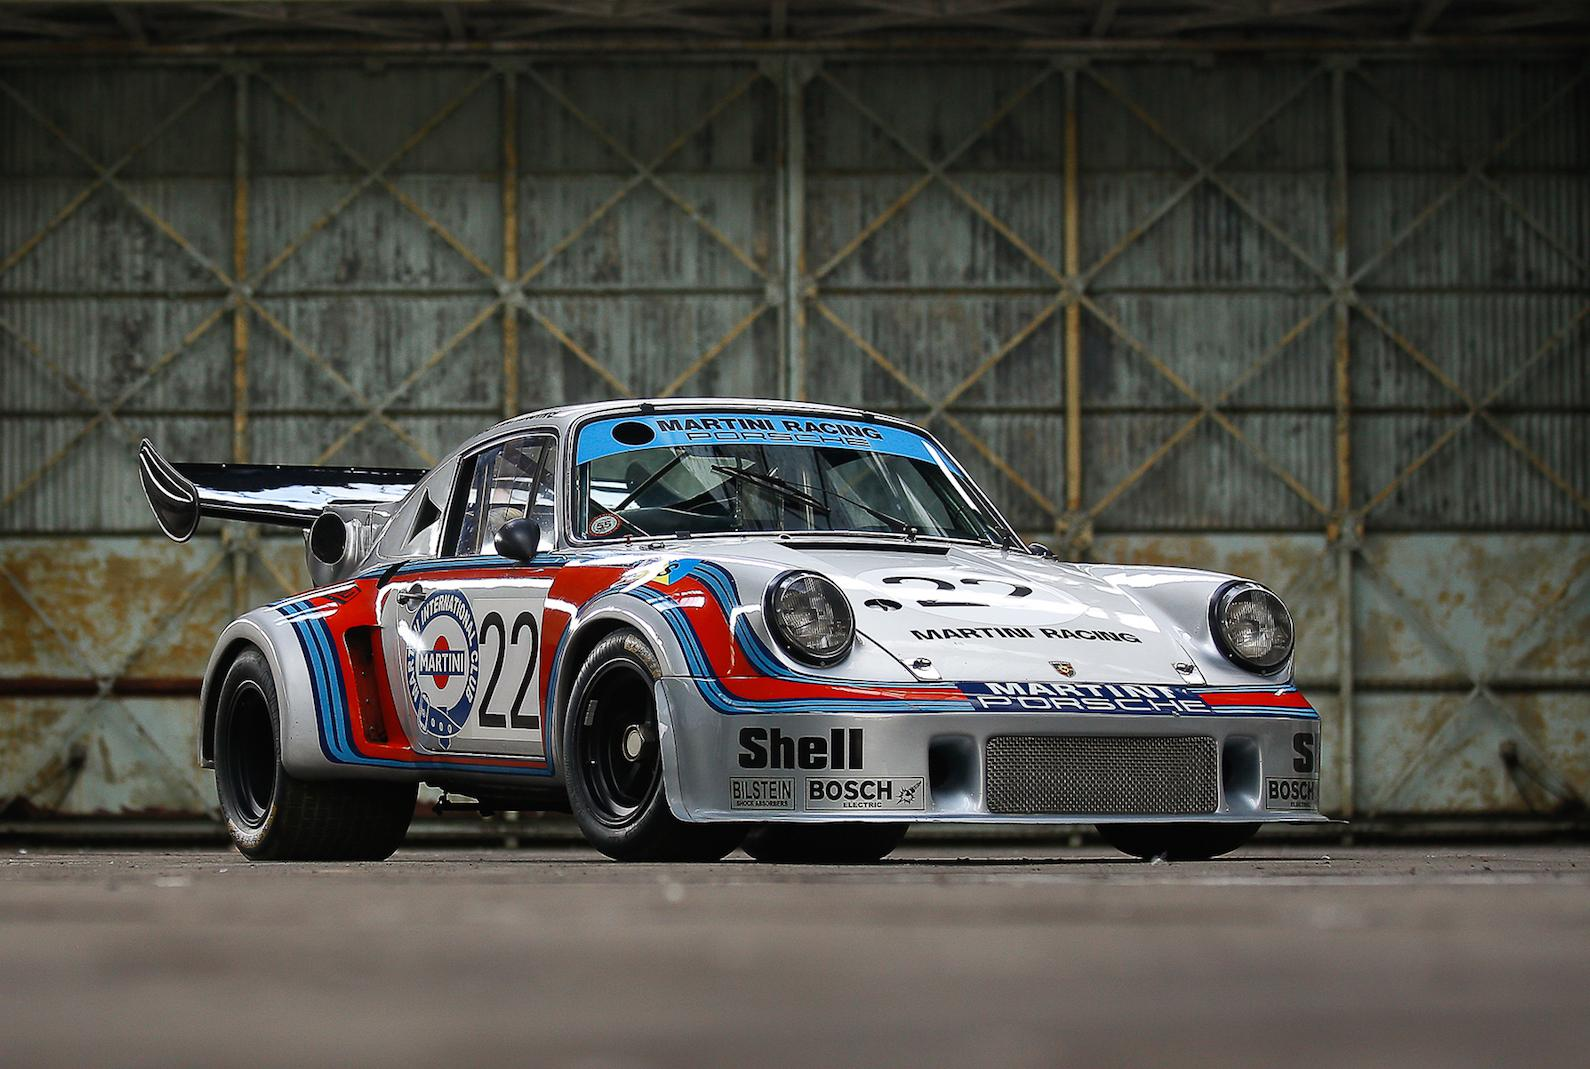 Legendary Le Mans Porsche RSR Turbo is coming to auction